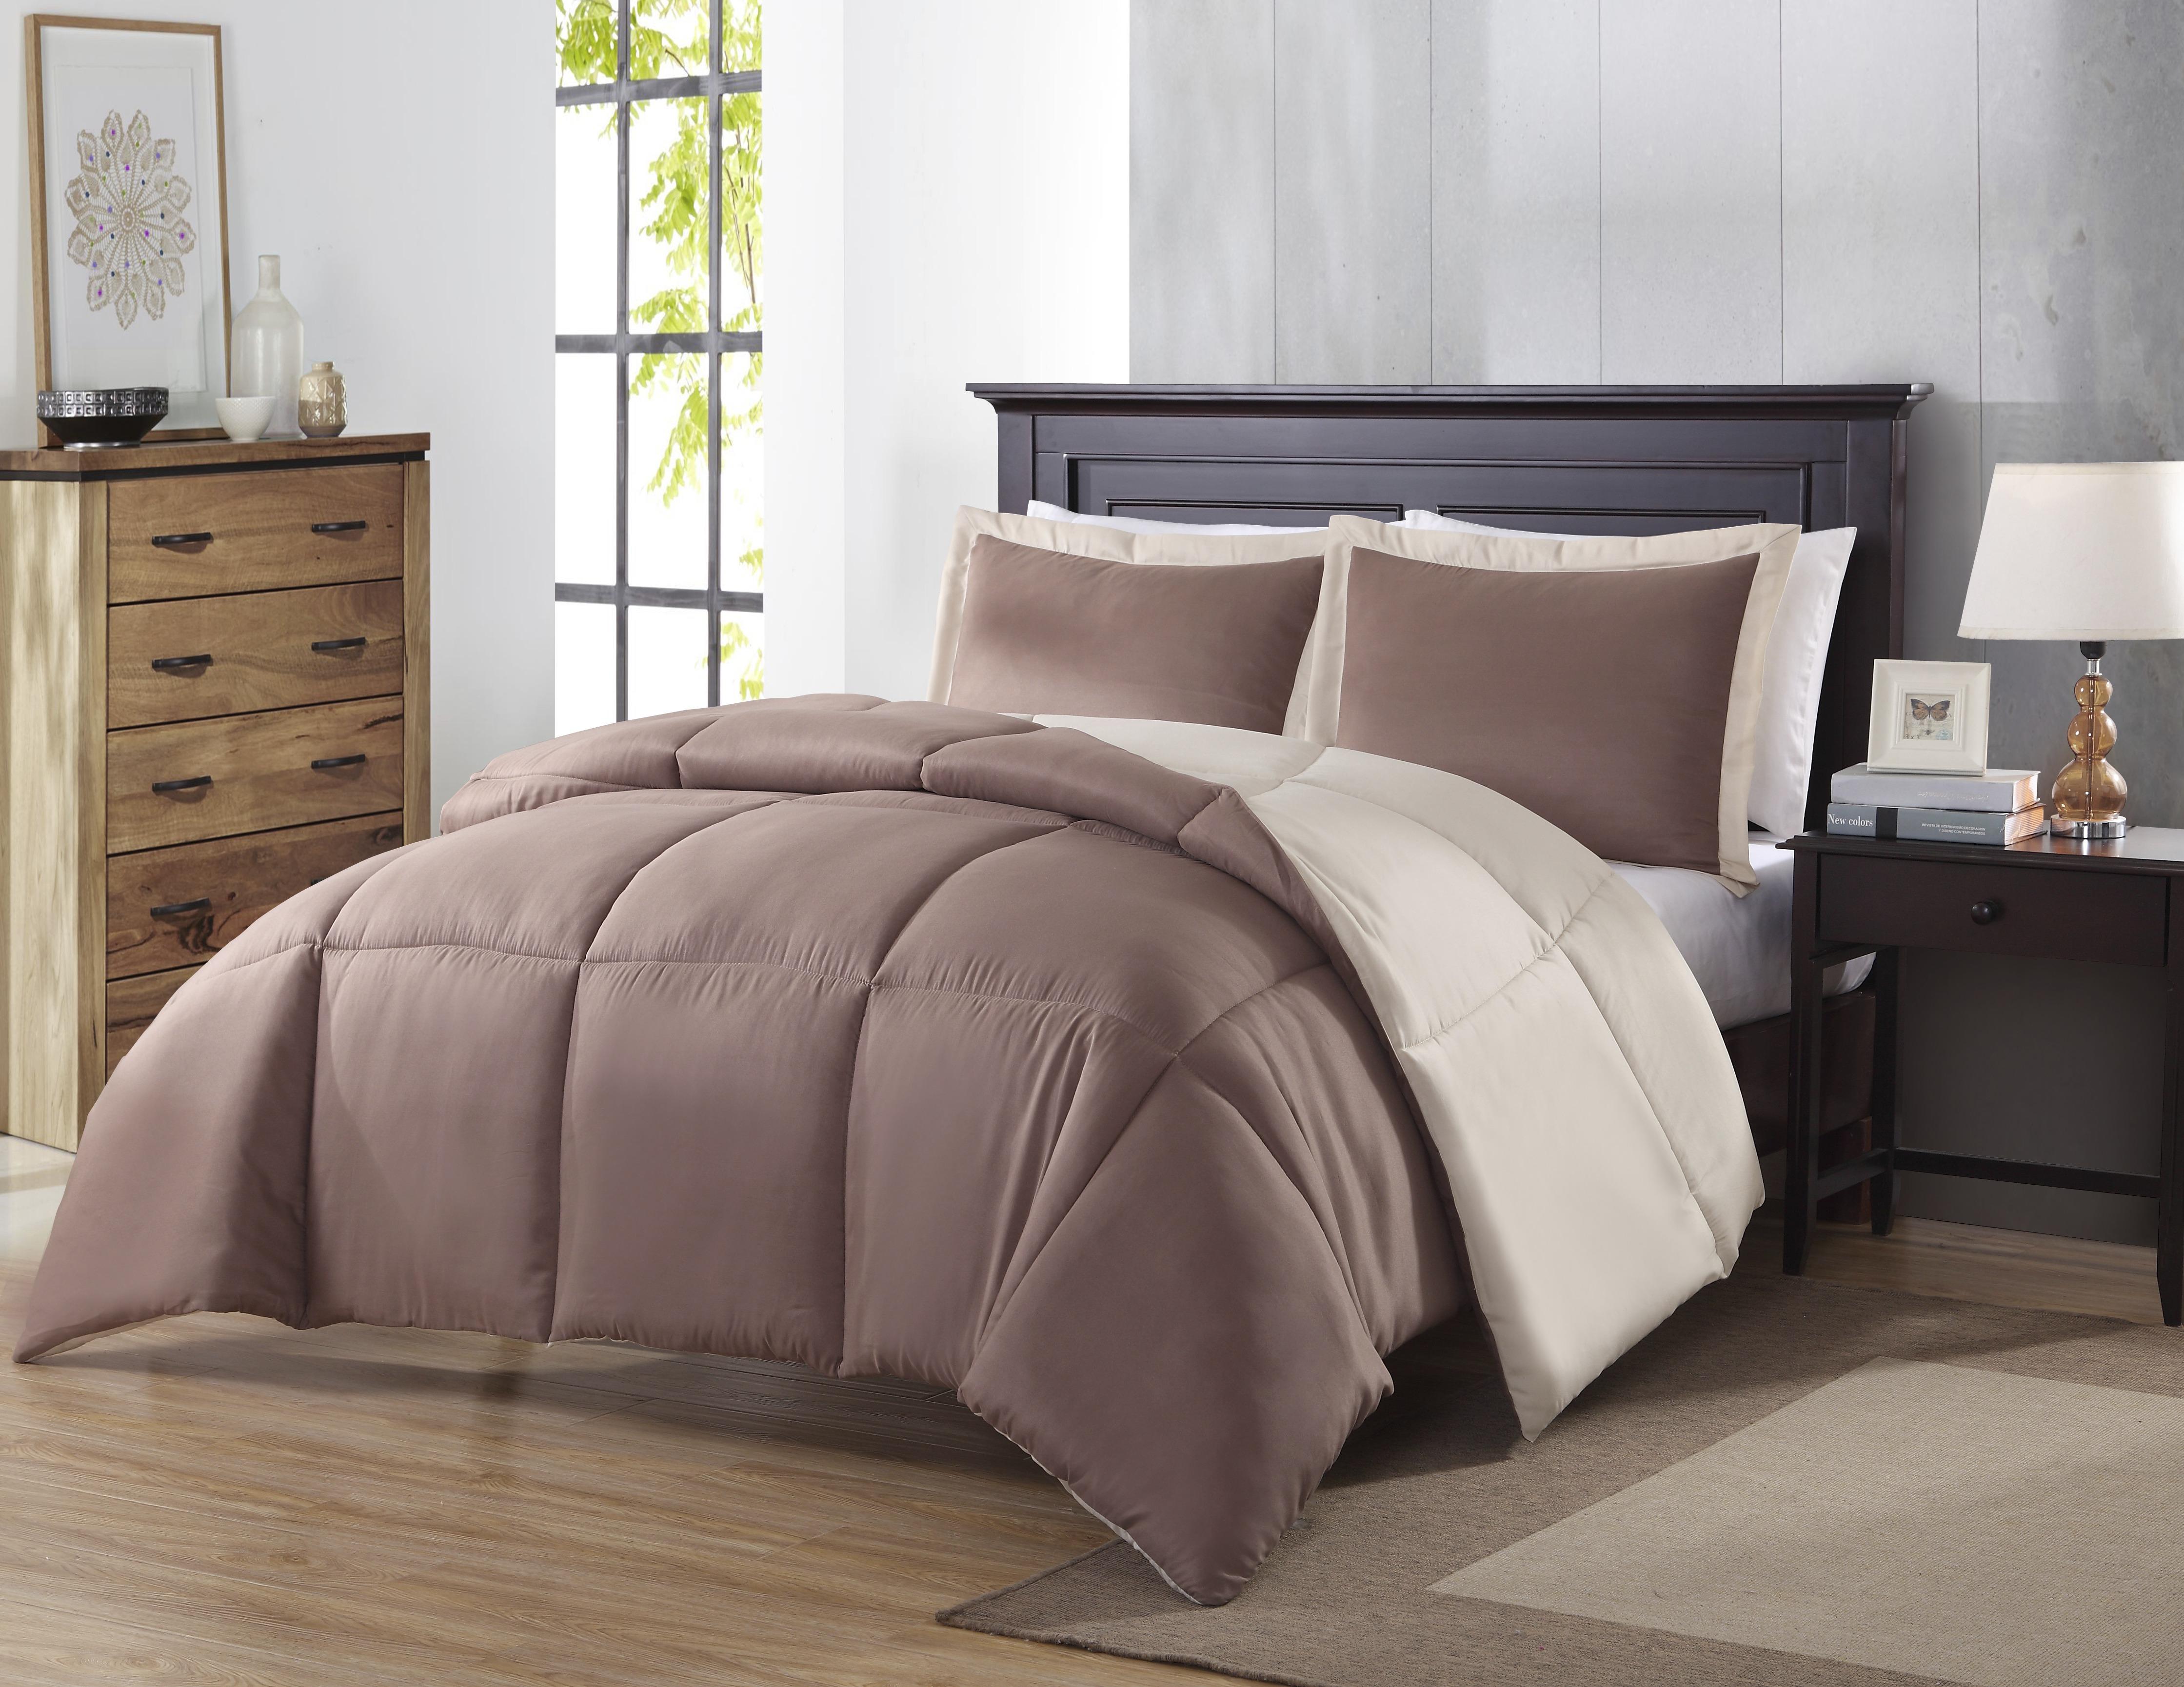 Colormate Reversible Comforter Set TaupeKhaki